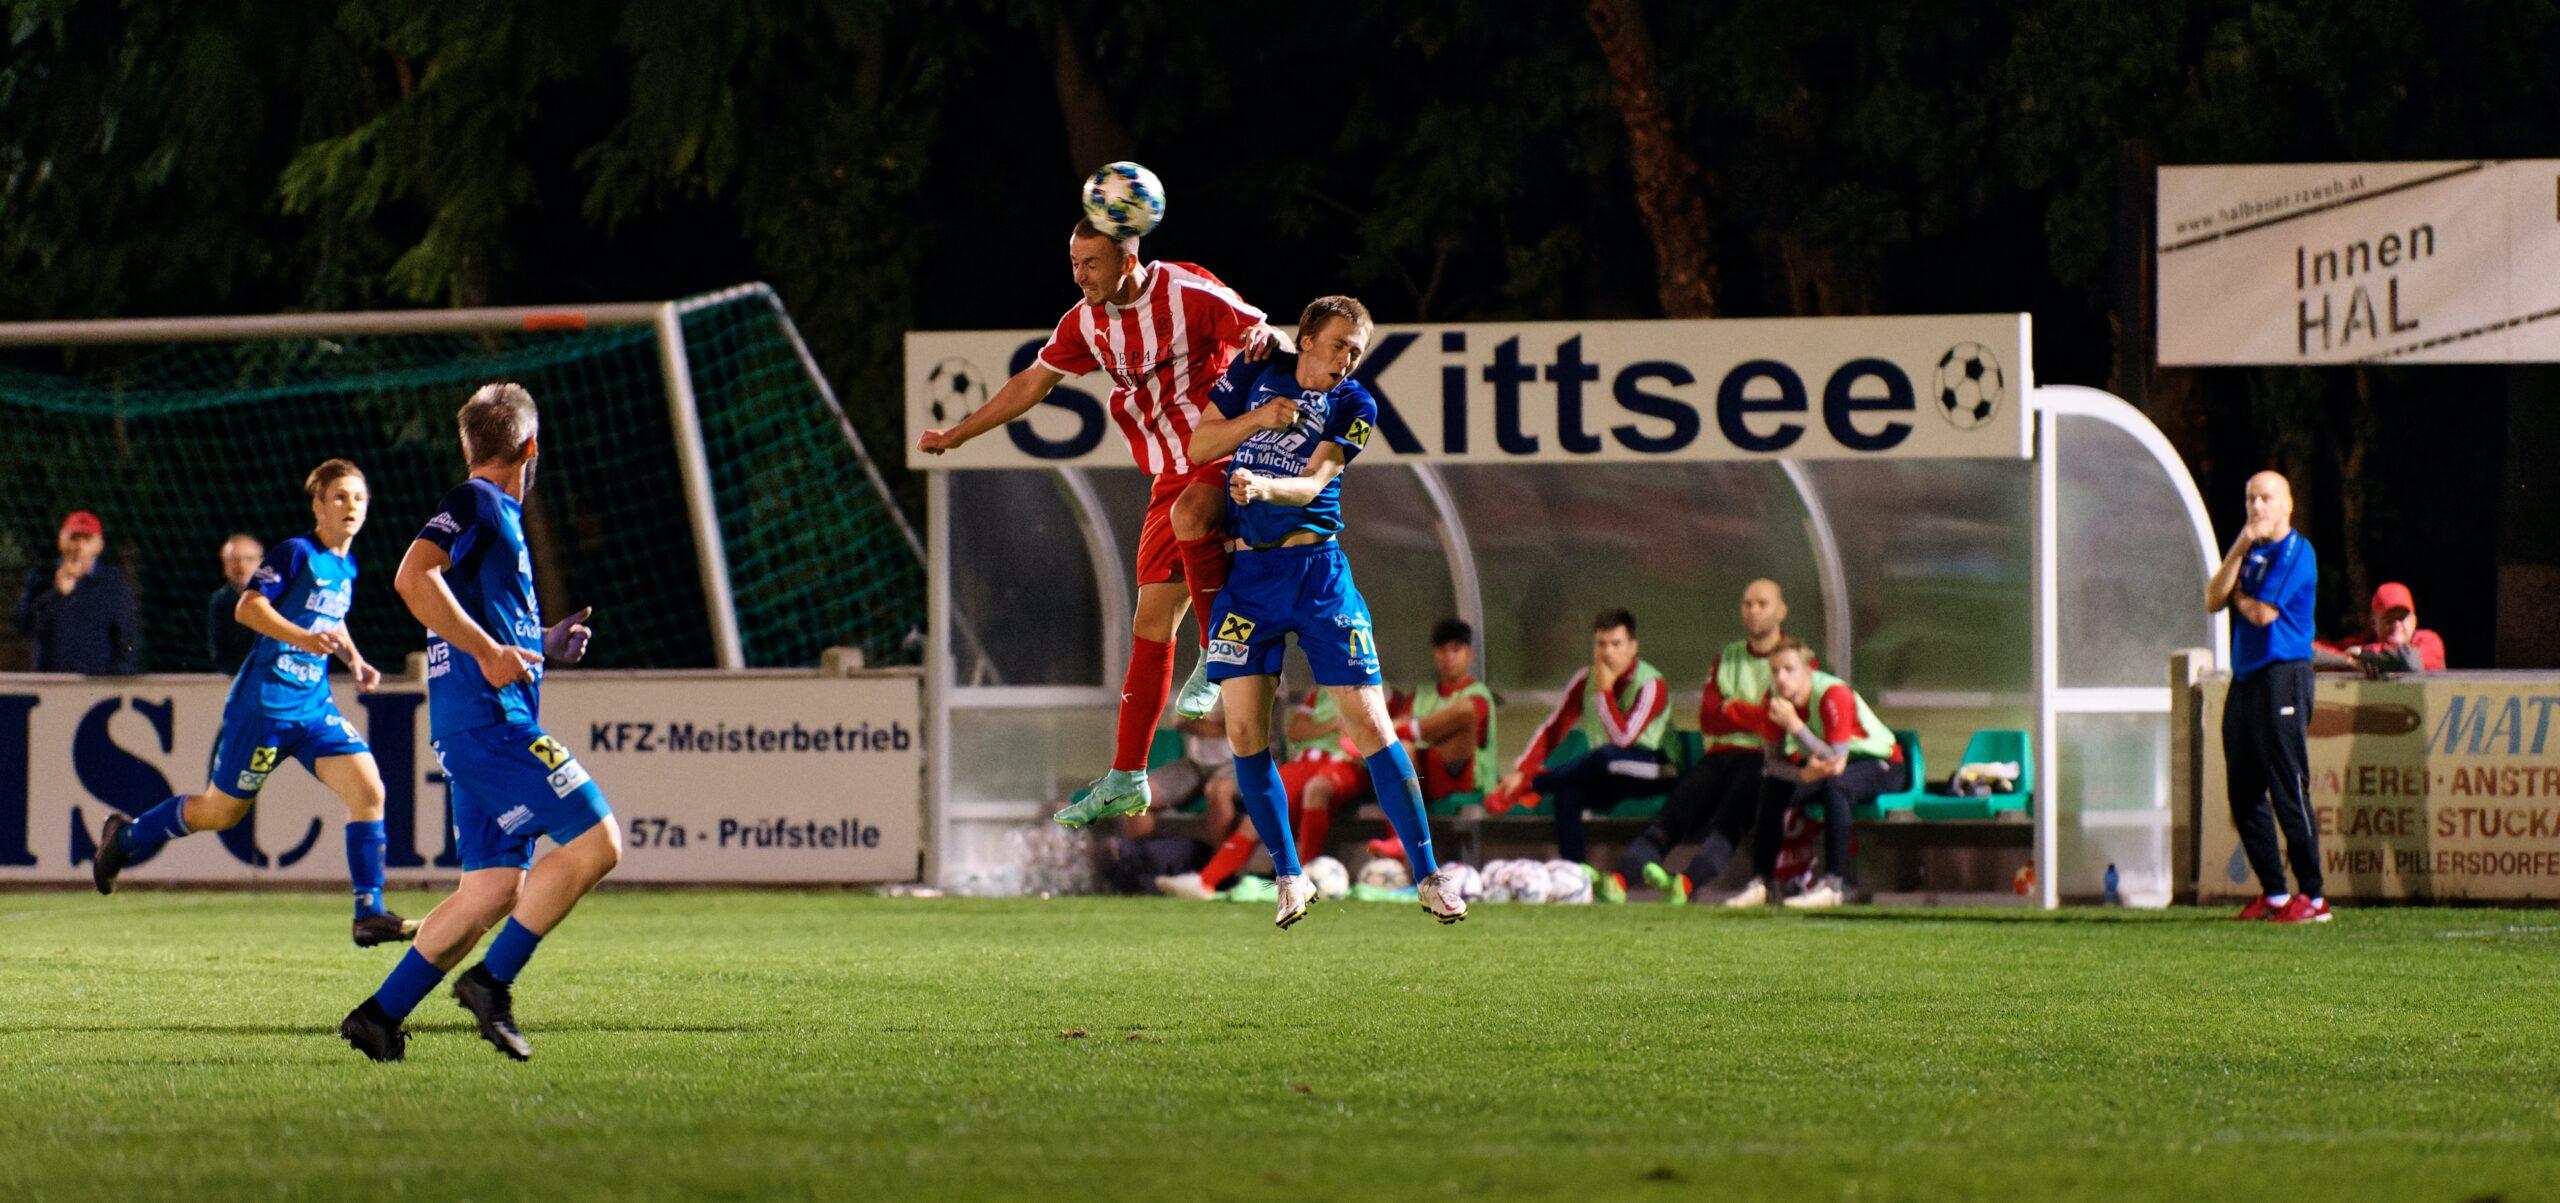 Pavol Bellas outleaps Fabian Schrammel